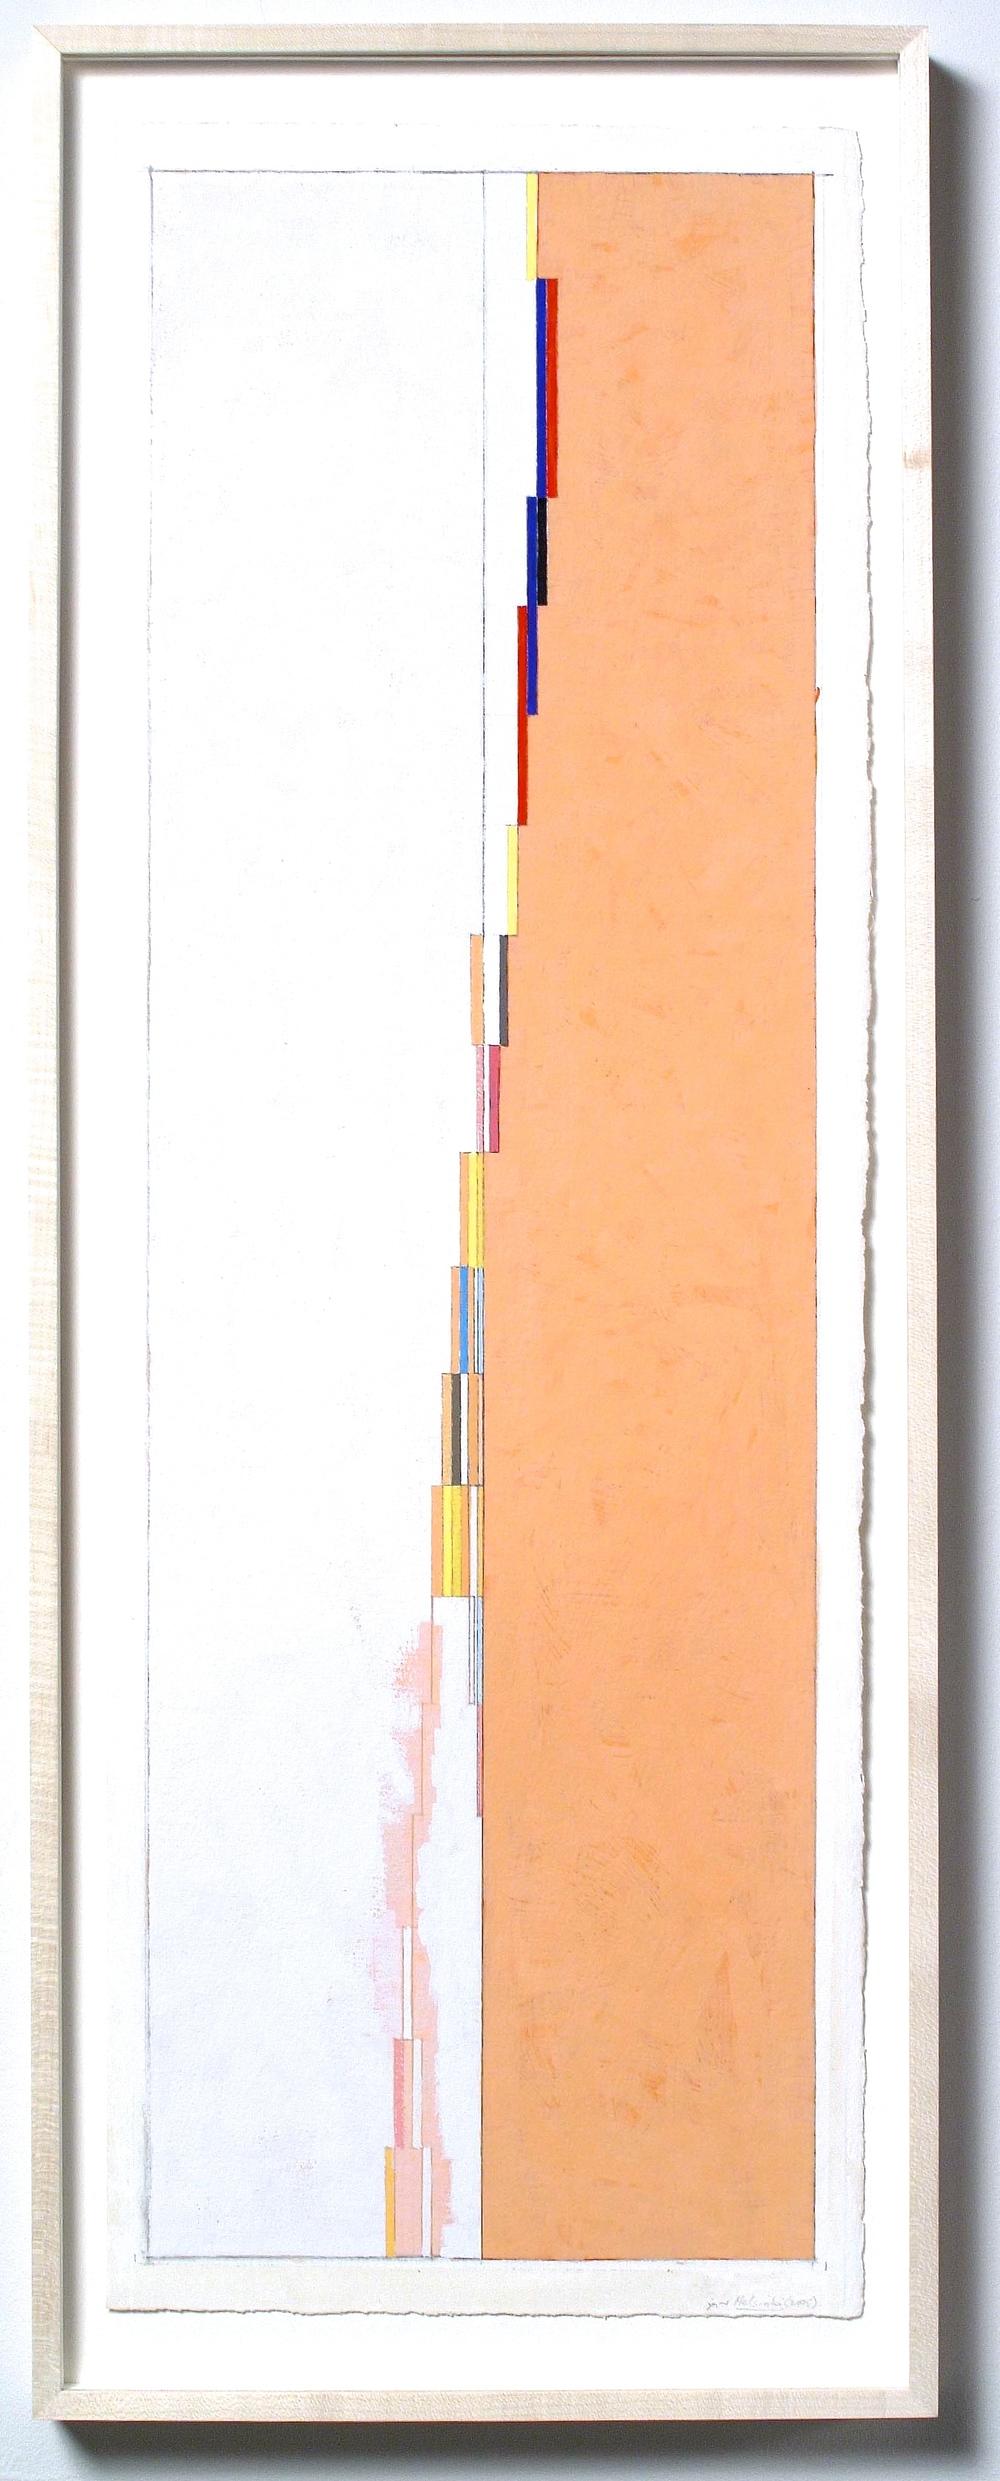 "Helsinki (PG58), 2005, gouache on paper, 32 1/4""x12 1/8"""